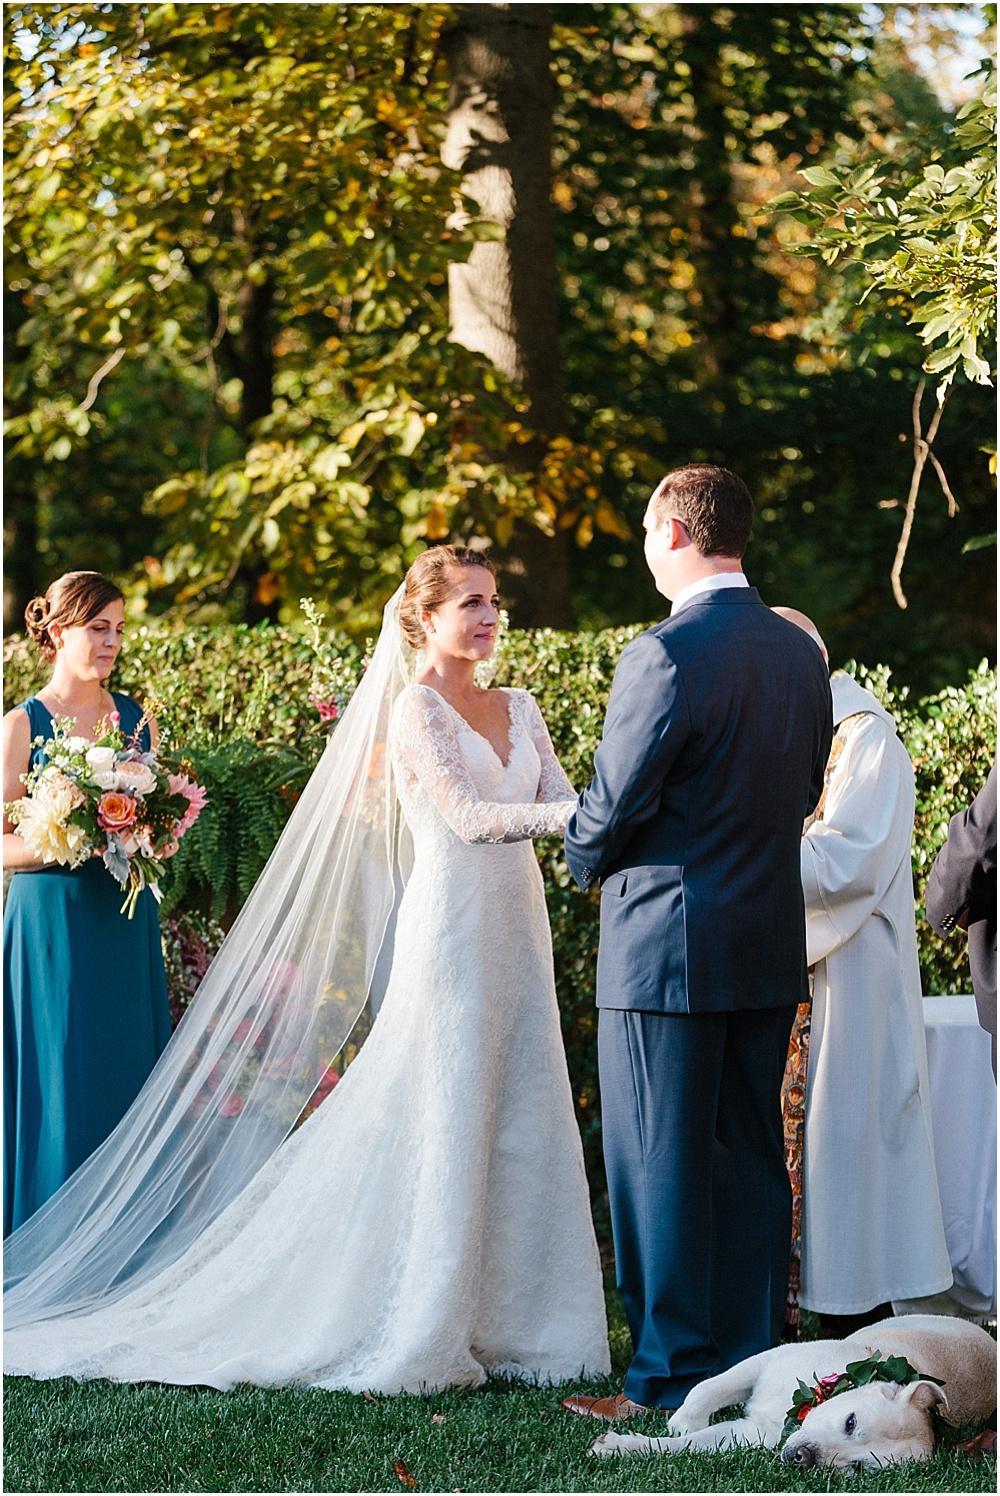 Vane_Baltimore_Country_Club_Wedding_Baltimore_Wedding_Photographer_0113